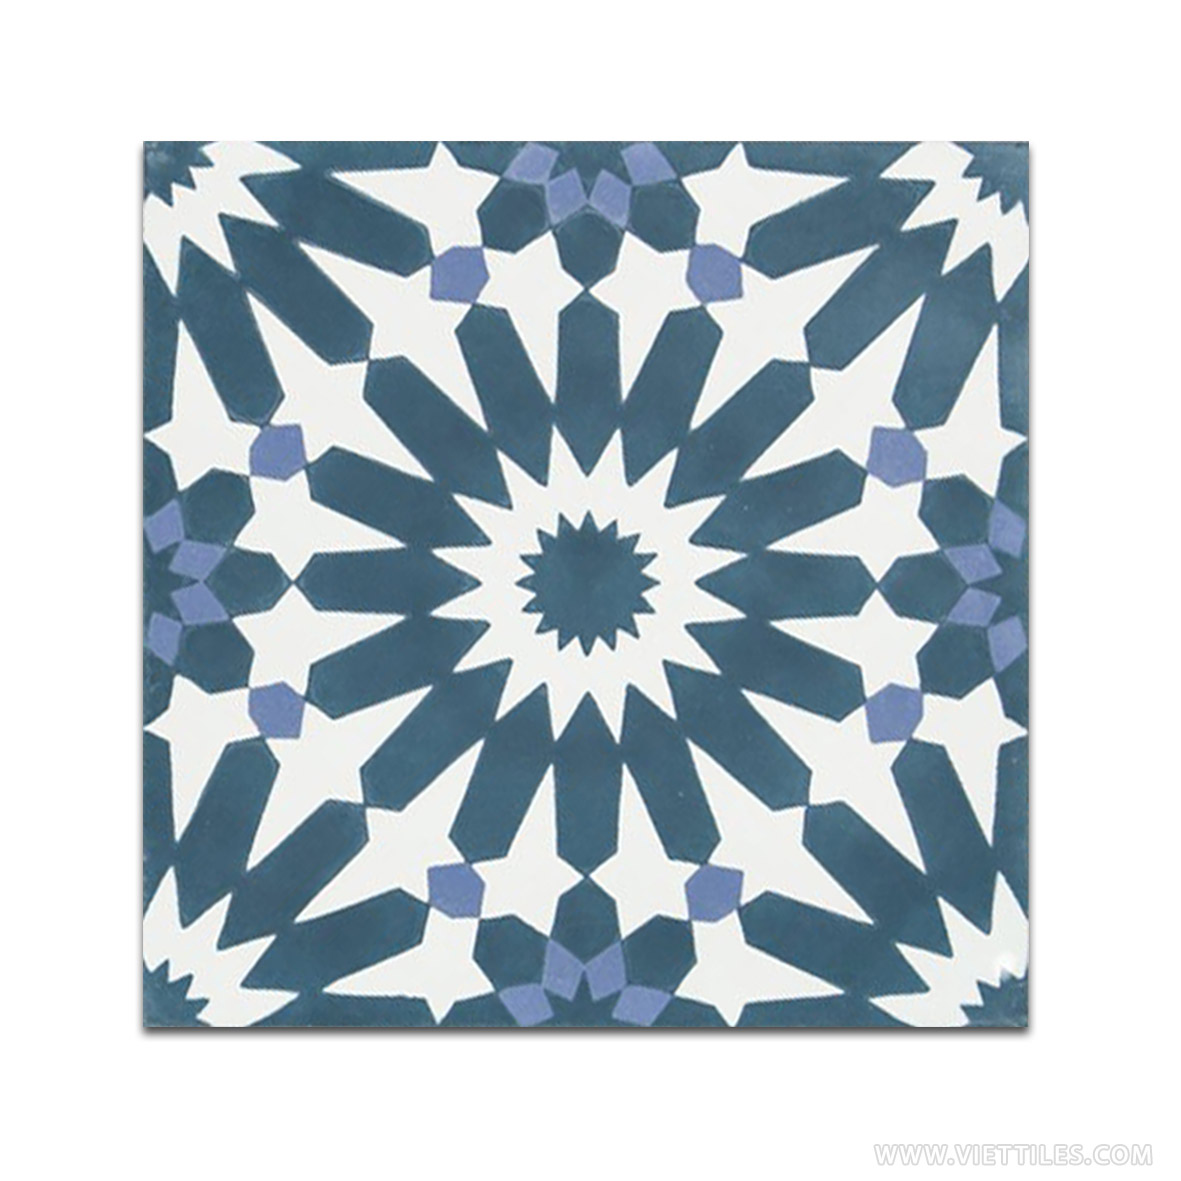 V20-395-T02 Cement Tile